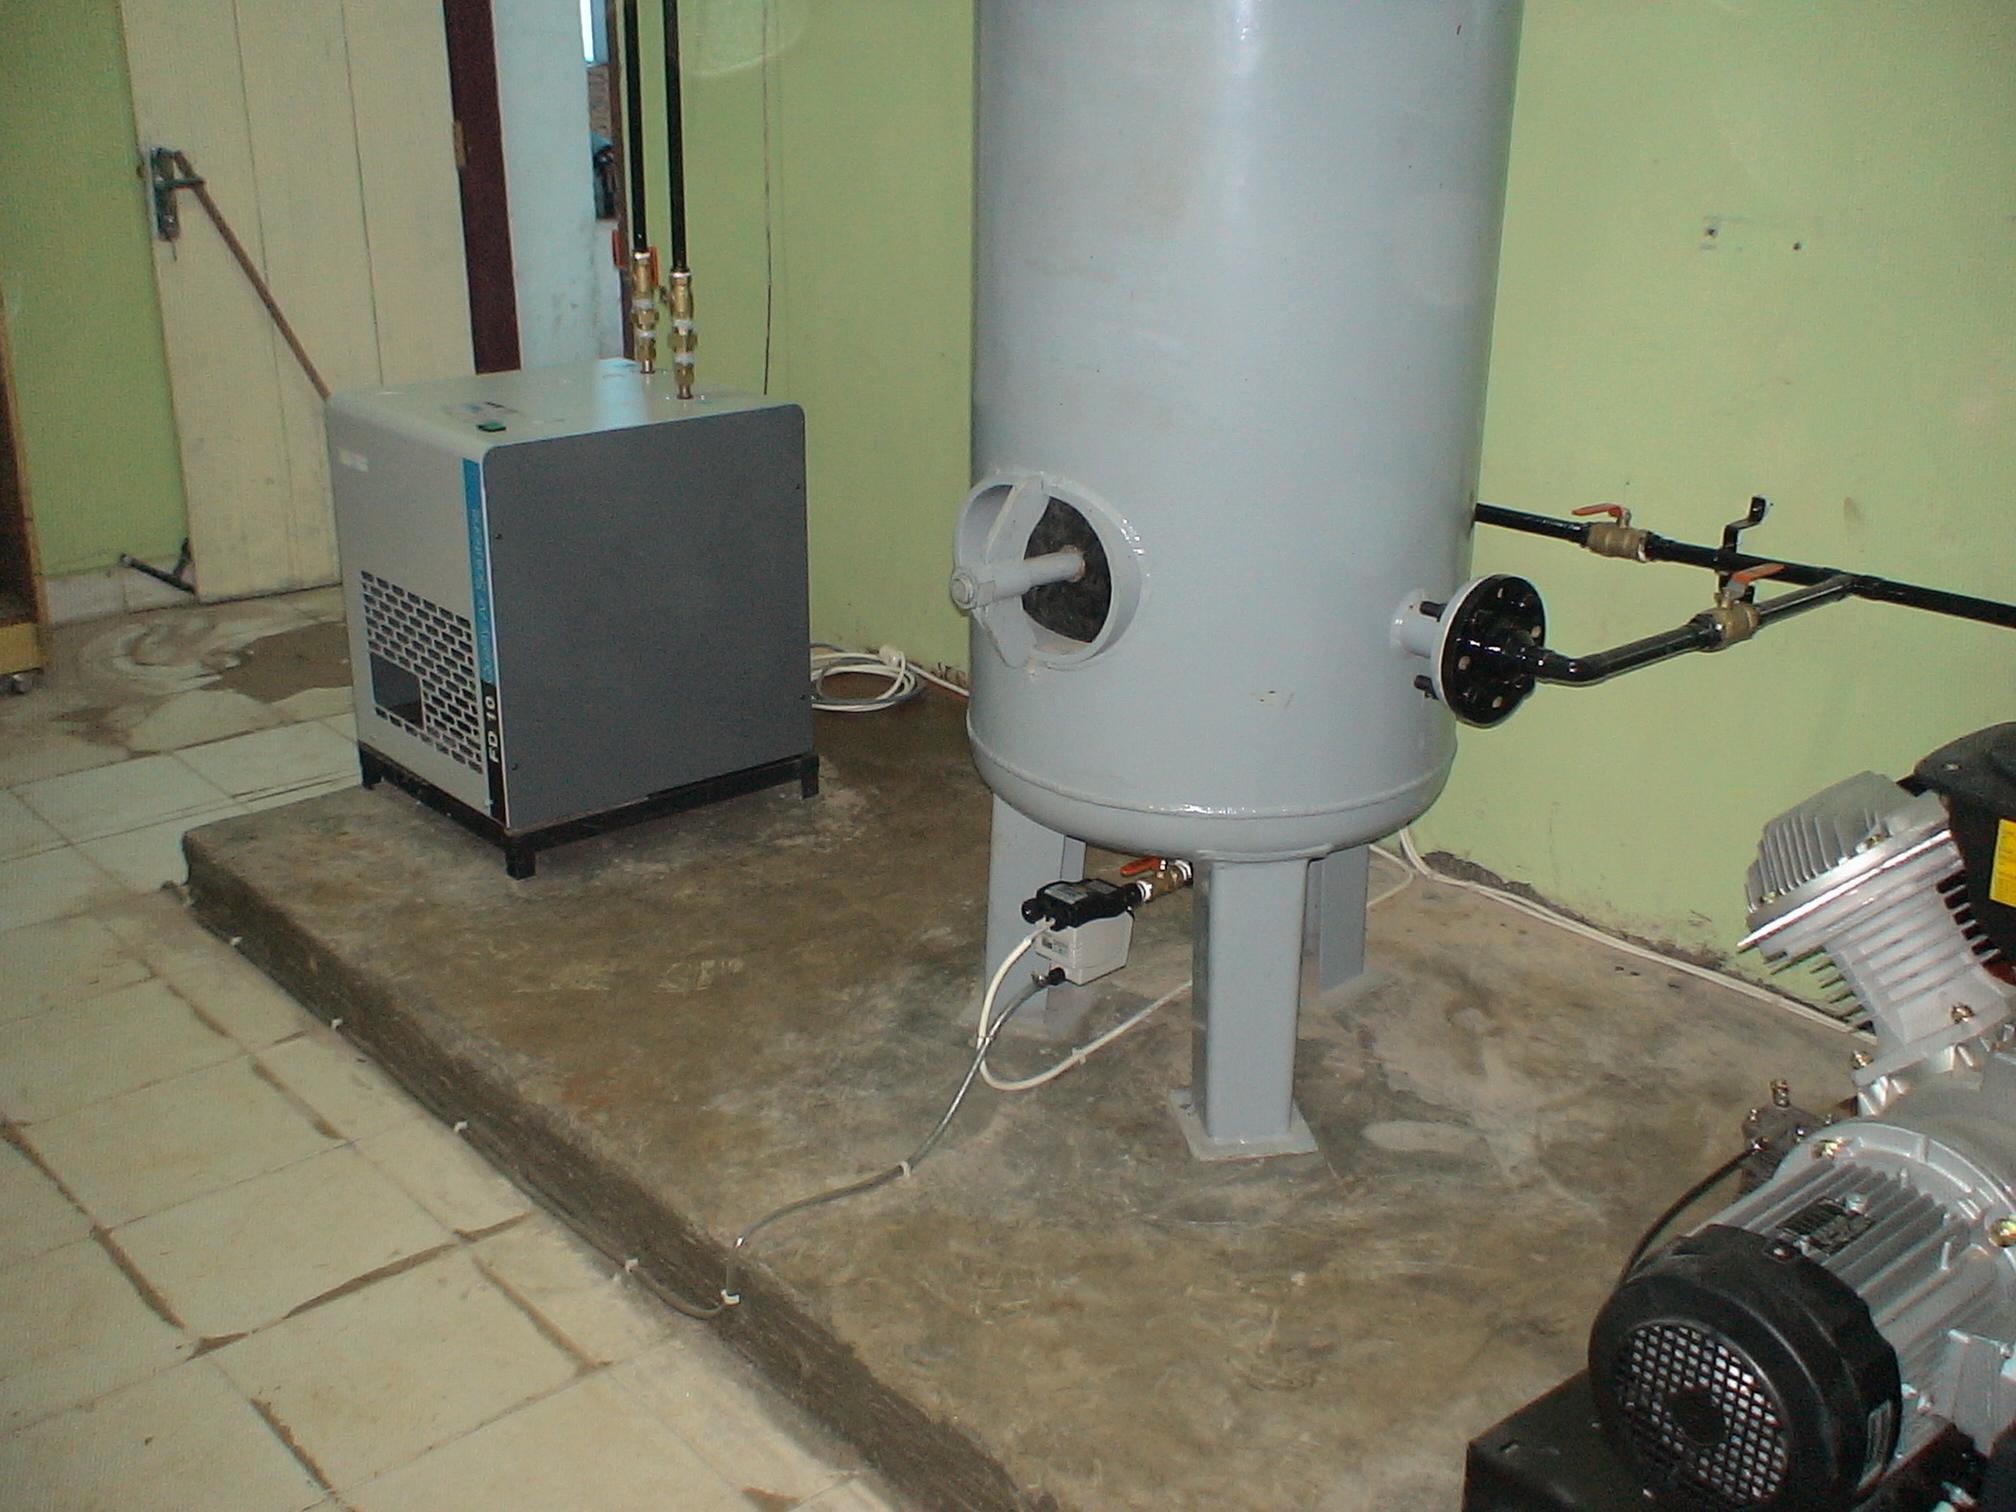 Kontraktor Gas Medis Rumah Sakit di Barabai Hulu Sungai Tengah Kalimantan Selatan